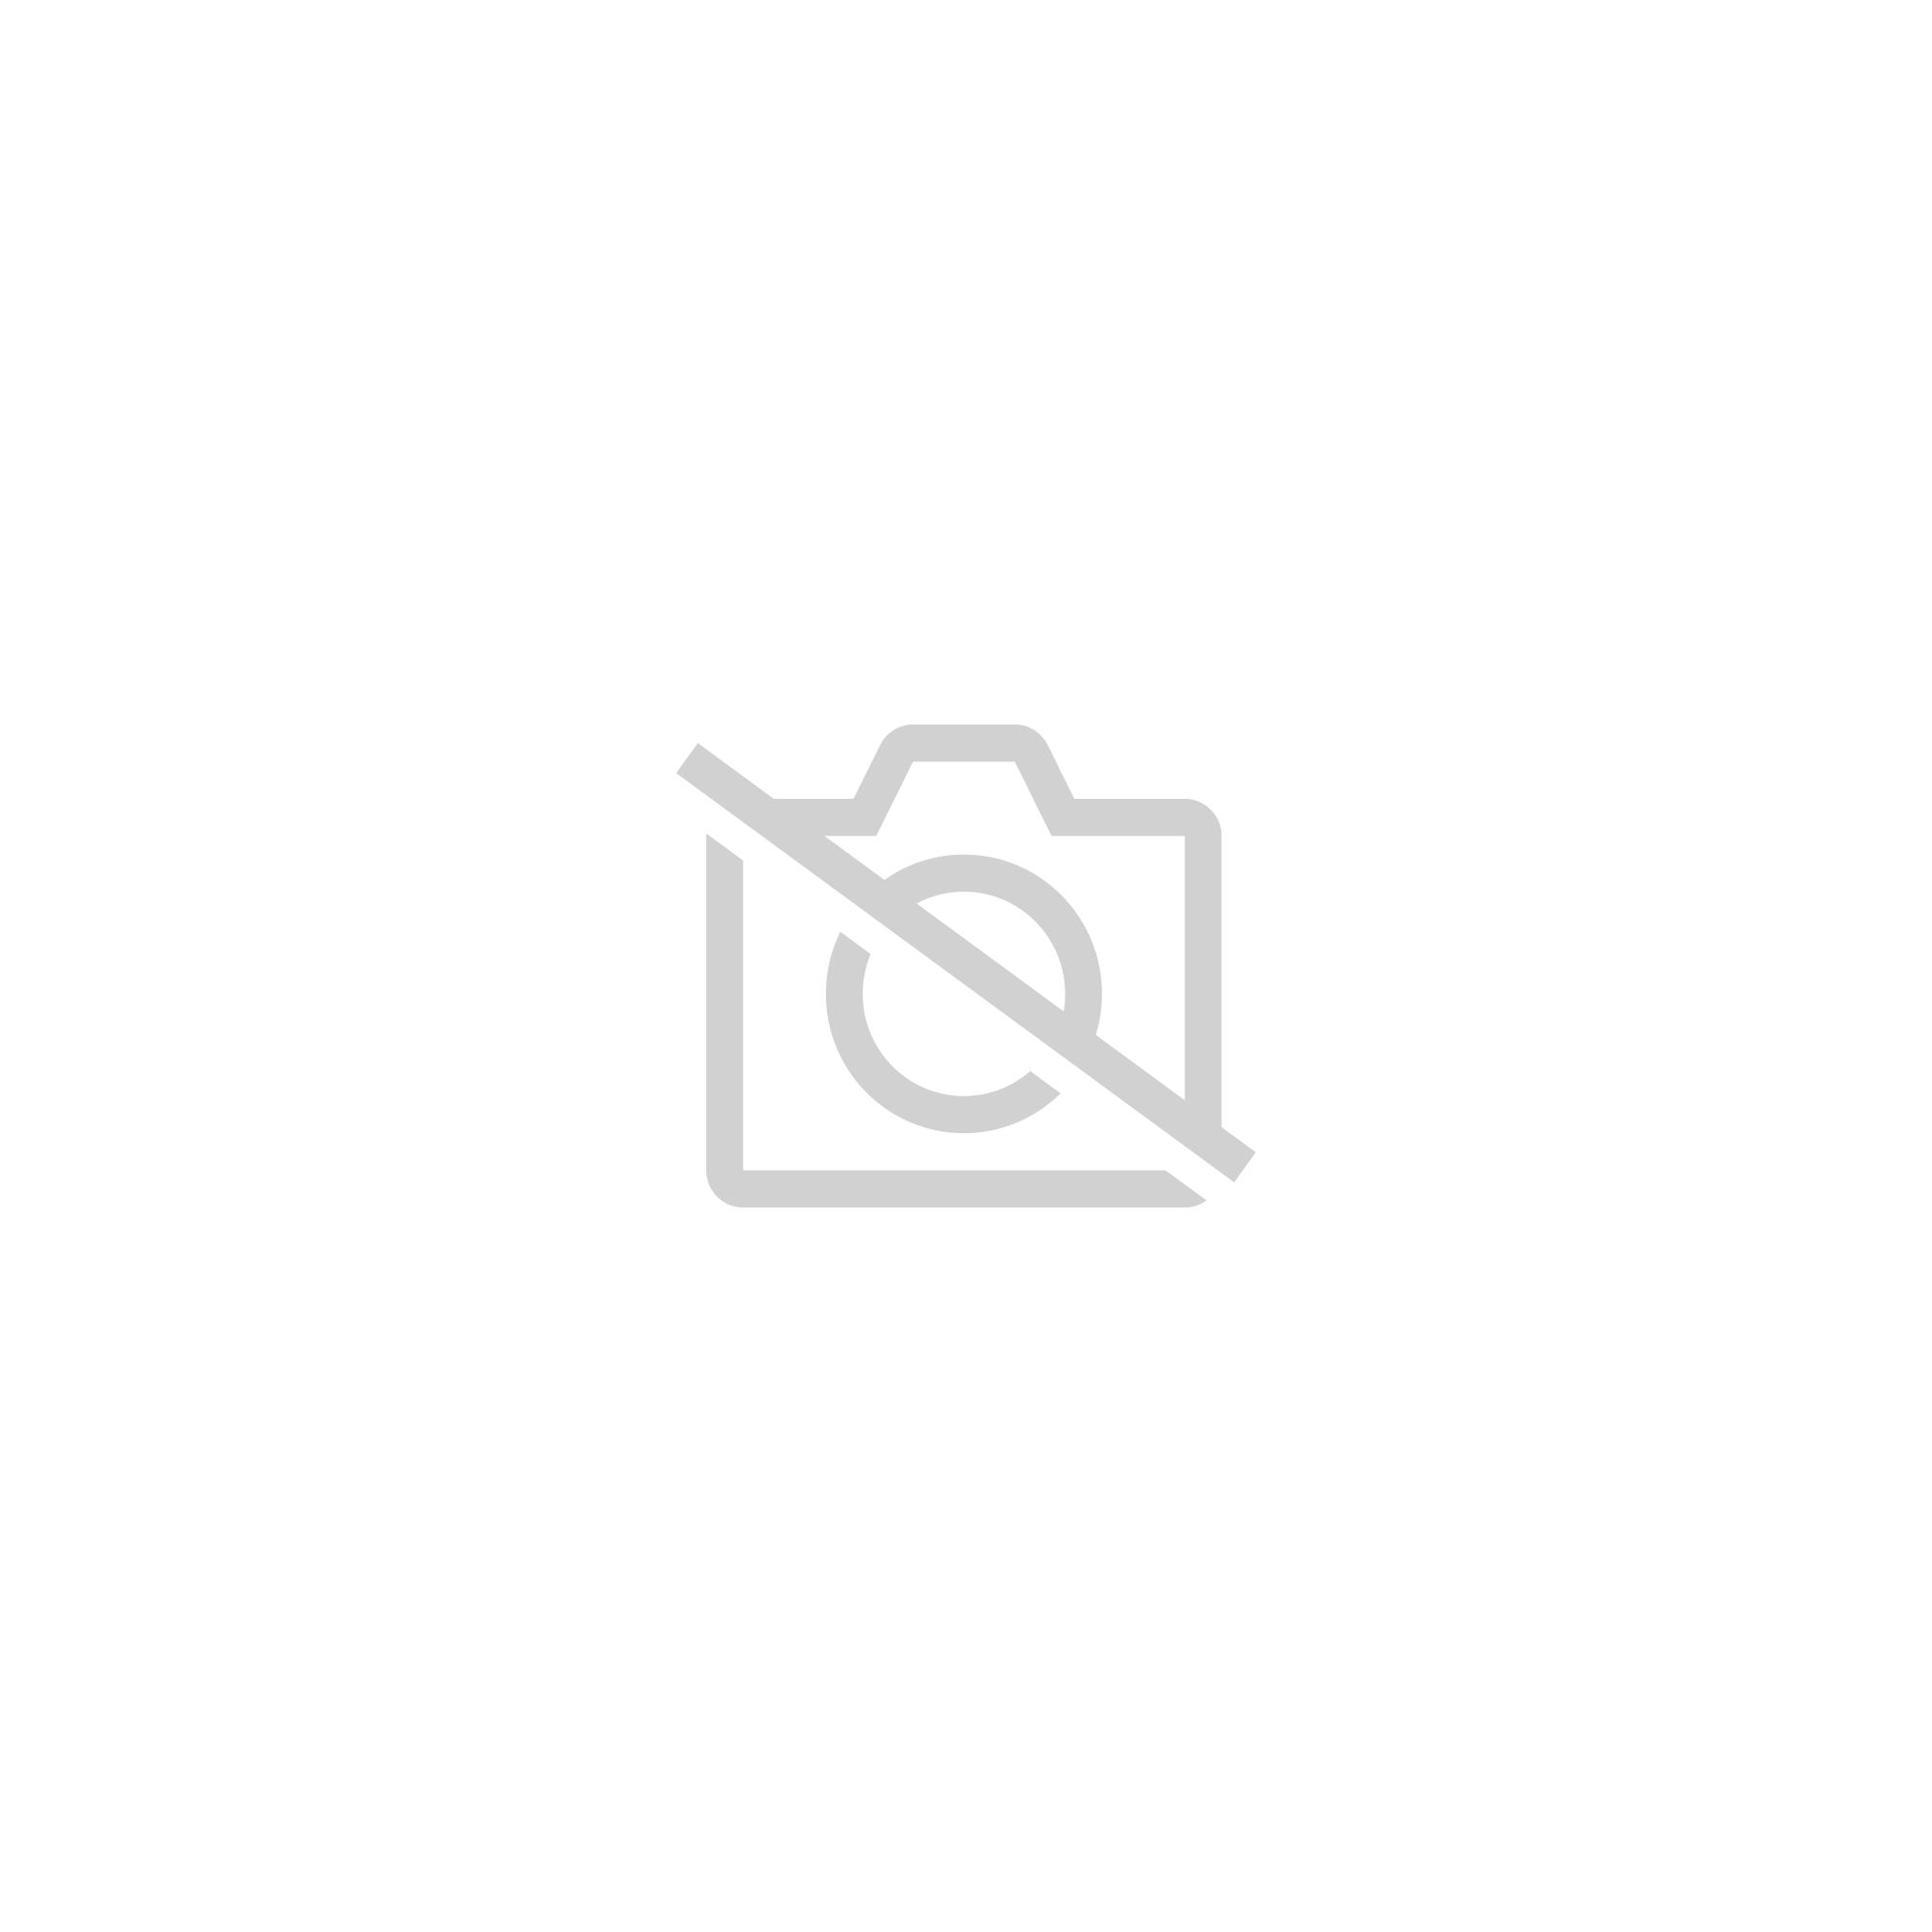 PIANO PLAY ALONG VOL.30 ELTON JOHN HITS CD